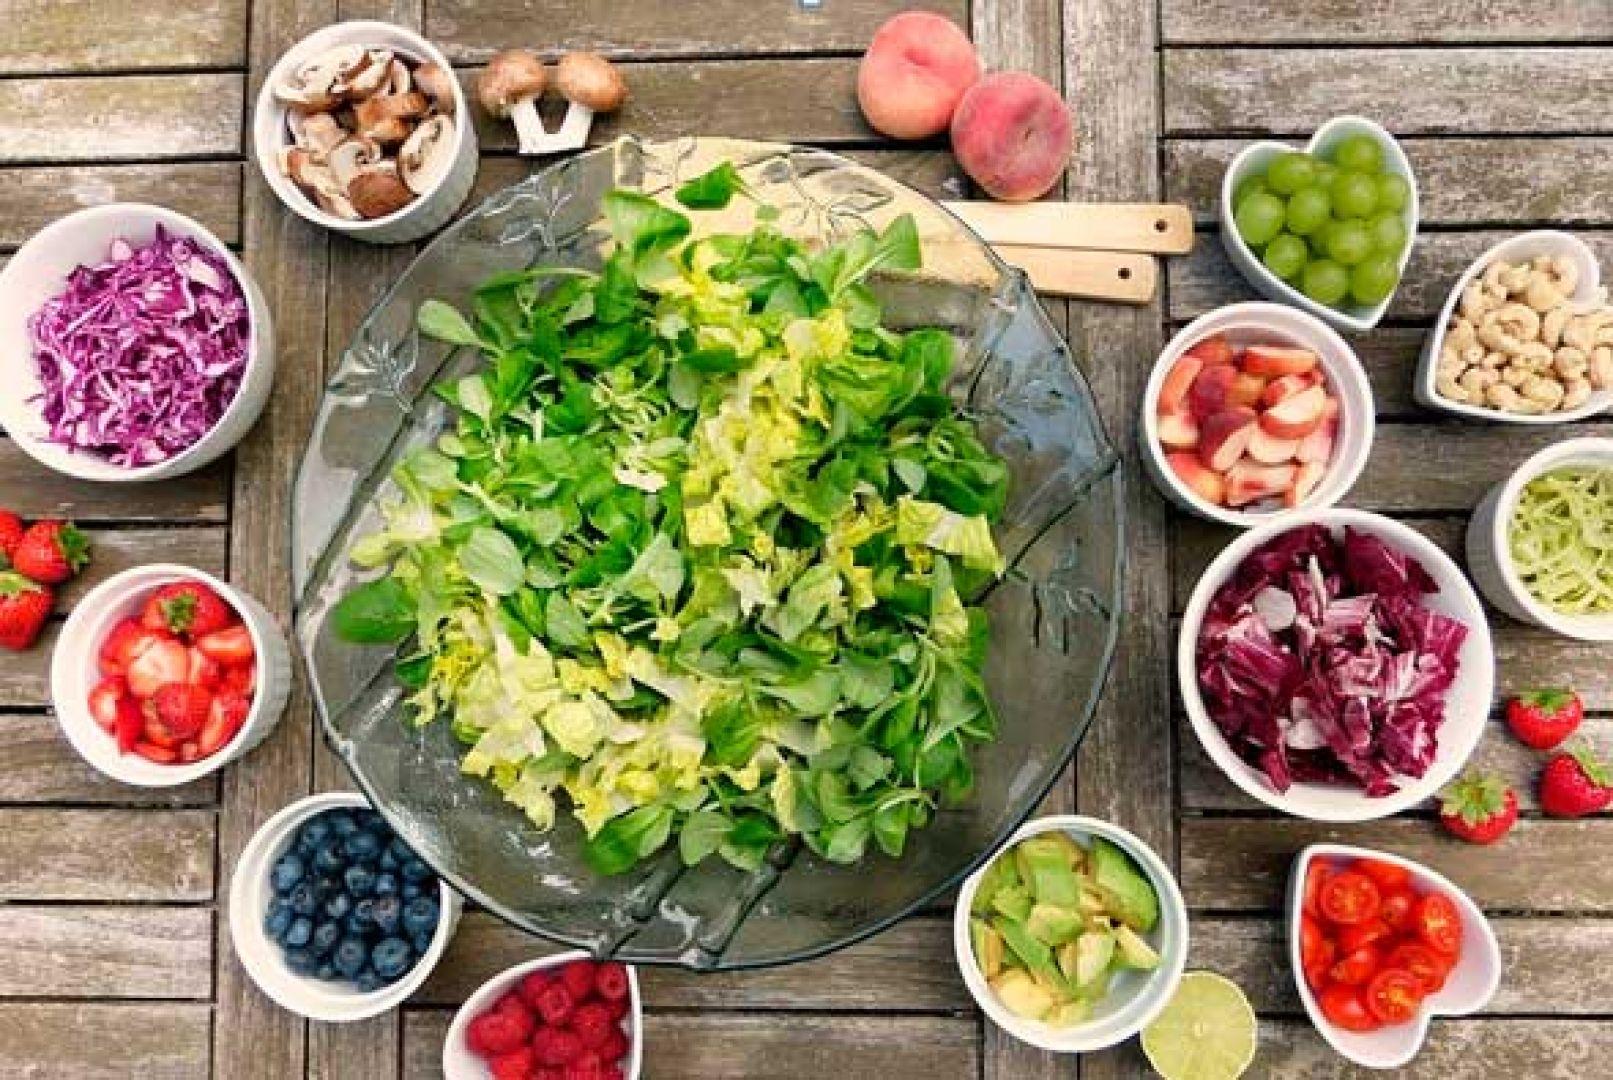 Los 5 mejores suplementos alimenticios para mejorar tu dieta vegana